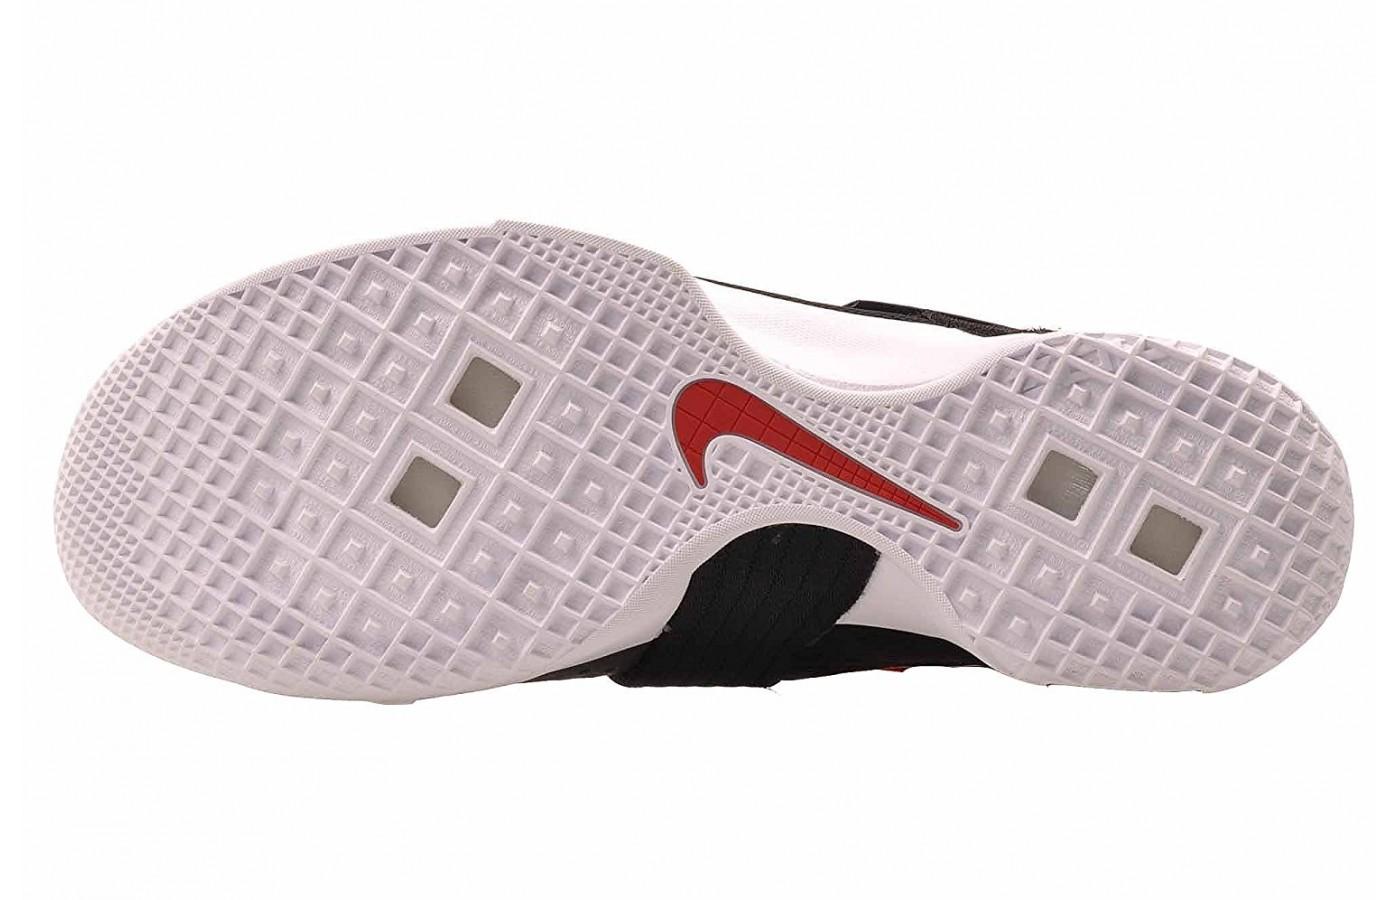 5ff083a32d3d Nike Zoom Lebron Soldier 10 Tested - WalkJogRun